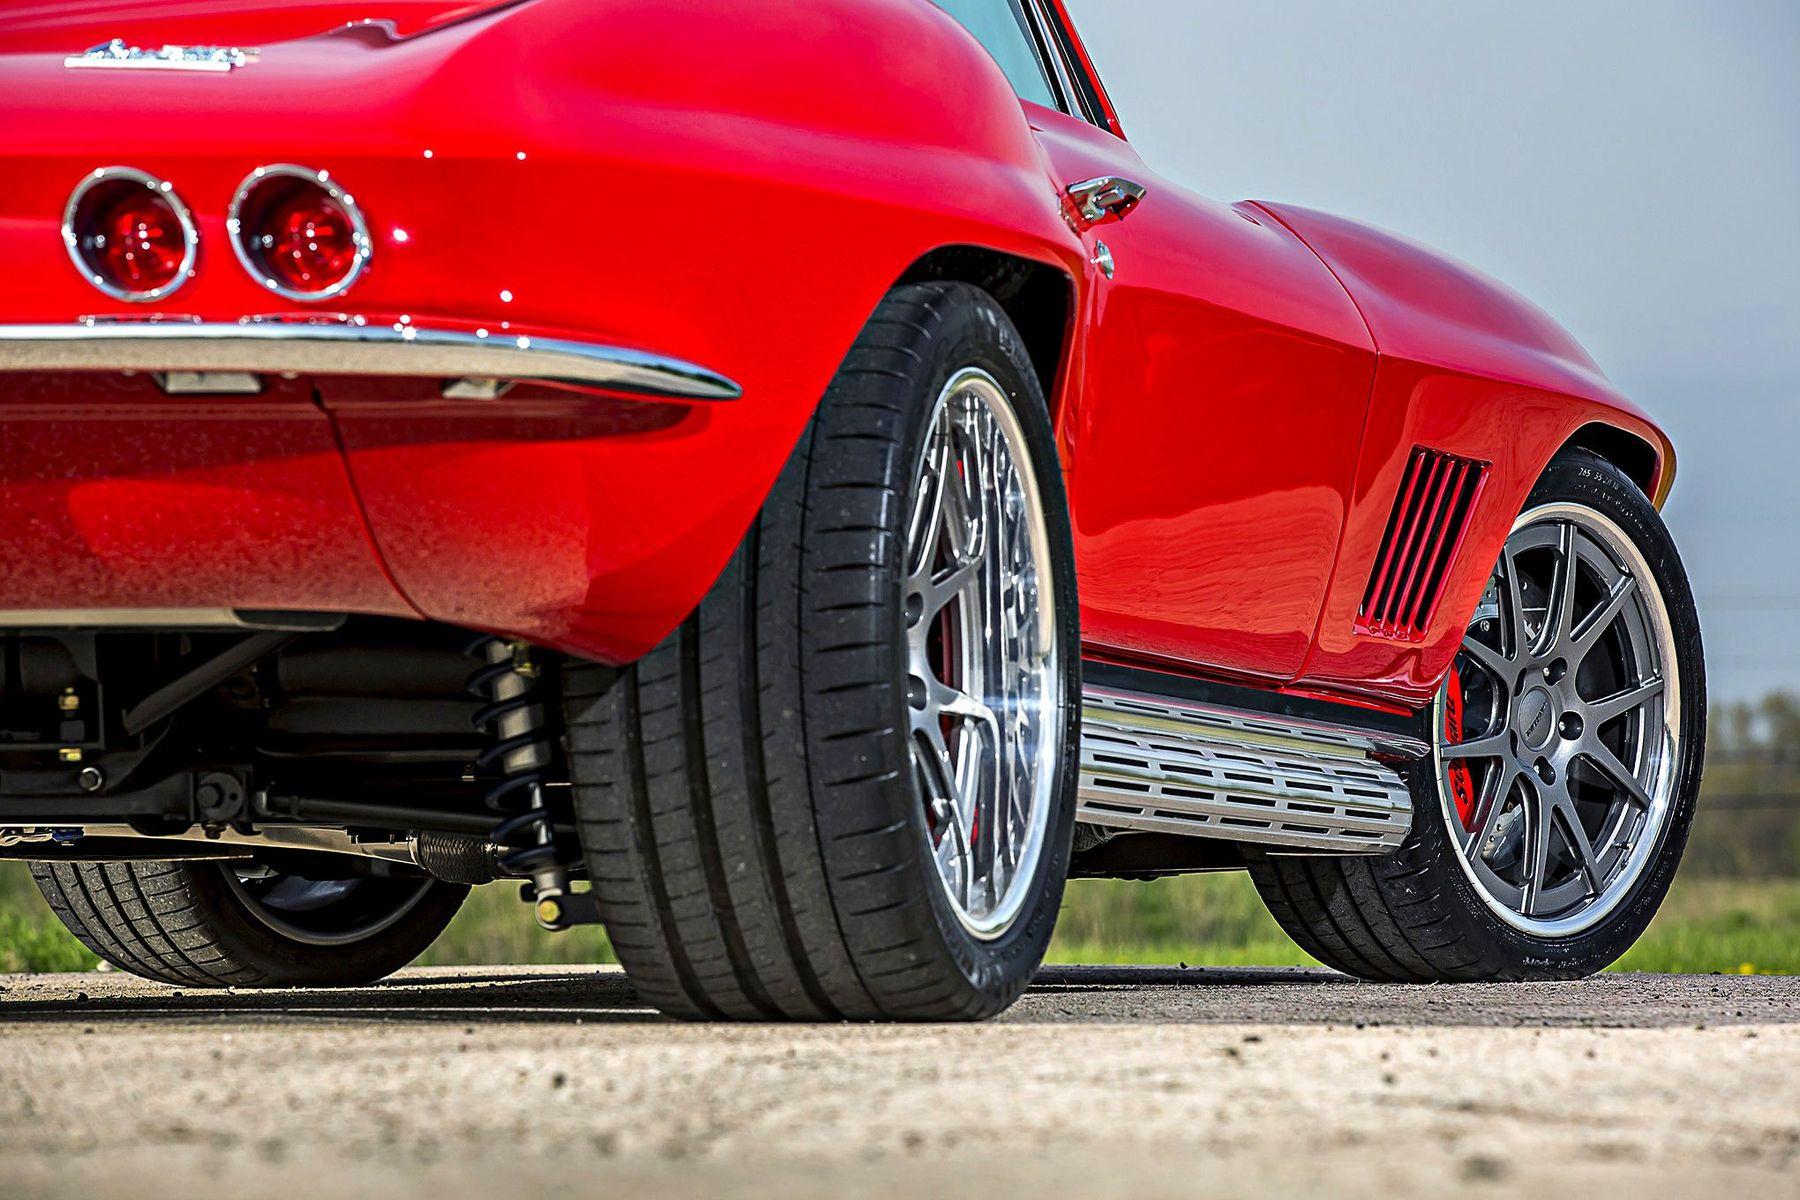 1967 Chevrolet Corvette Stingray | Paul's Schwartz Performance '67 Corvette Sting Ray Widebody on Forgeline GA3C Wheels